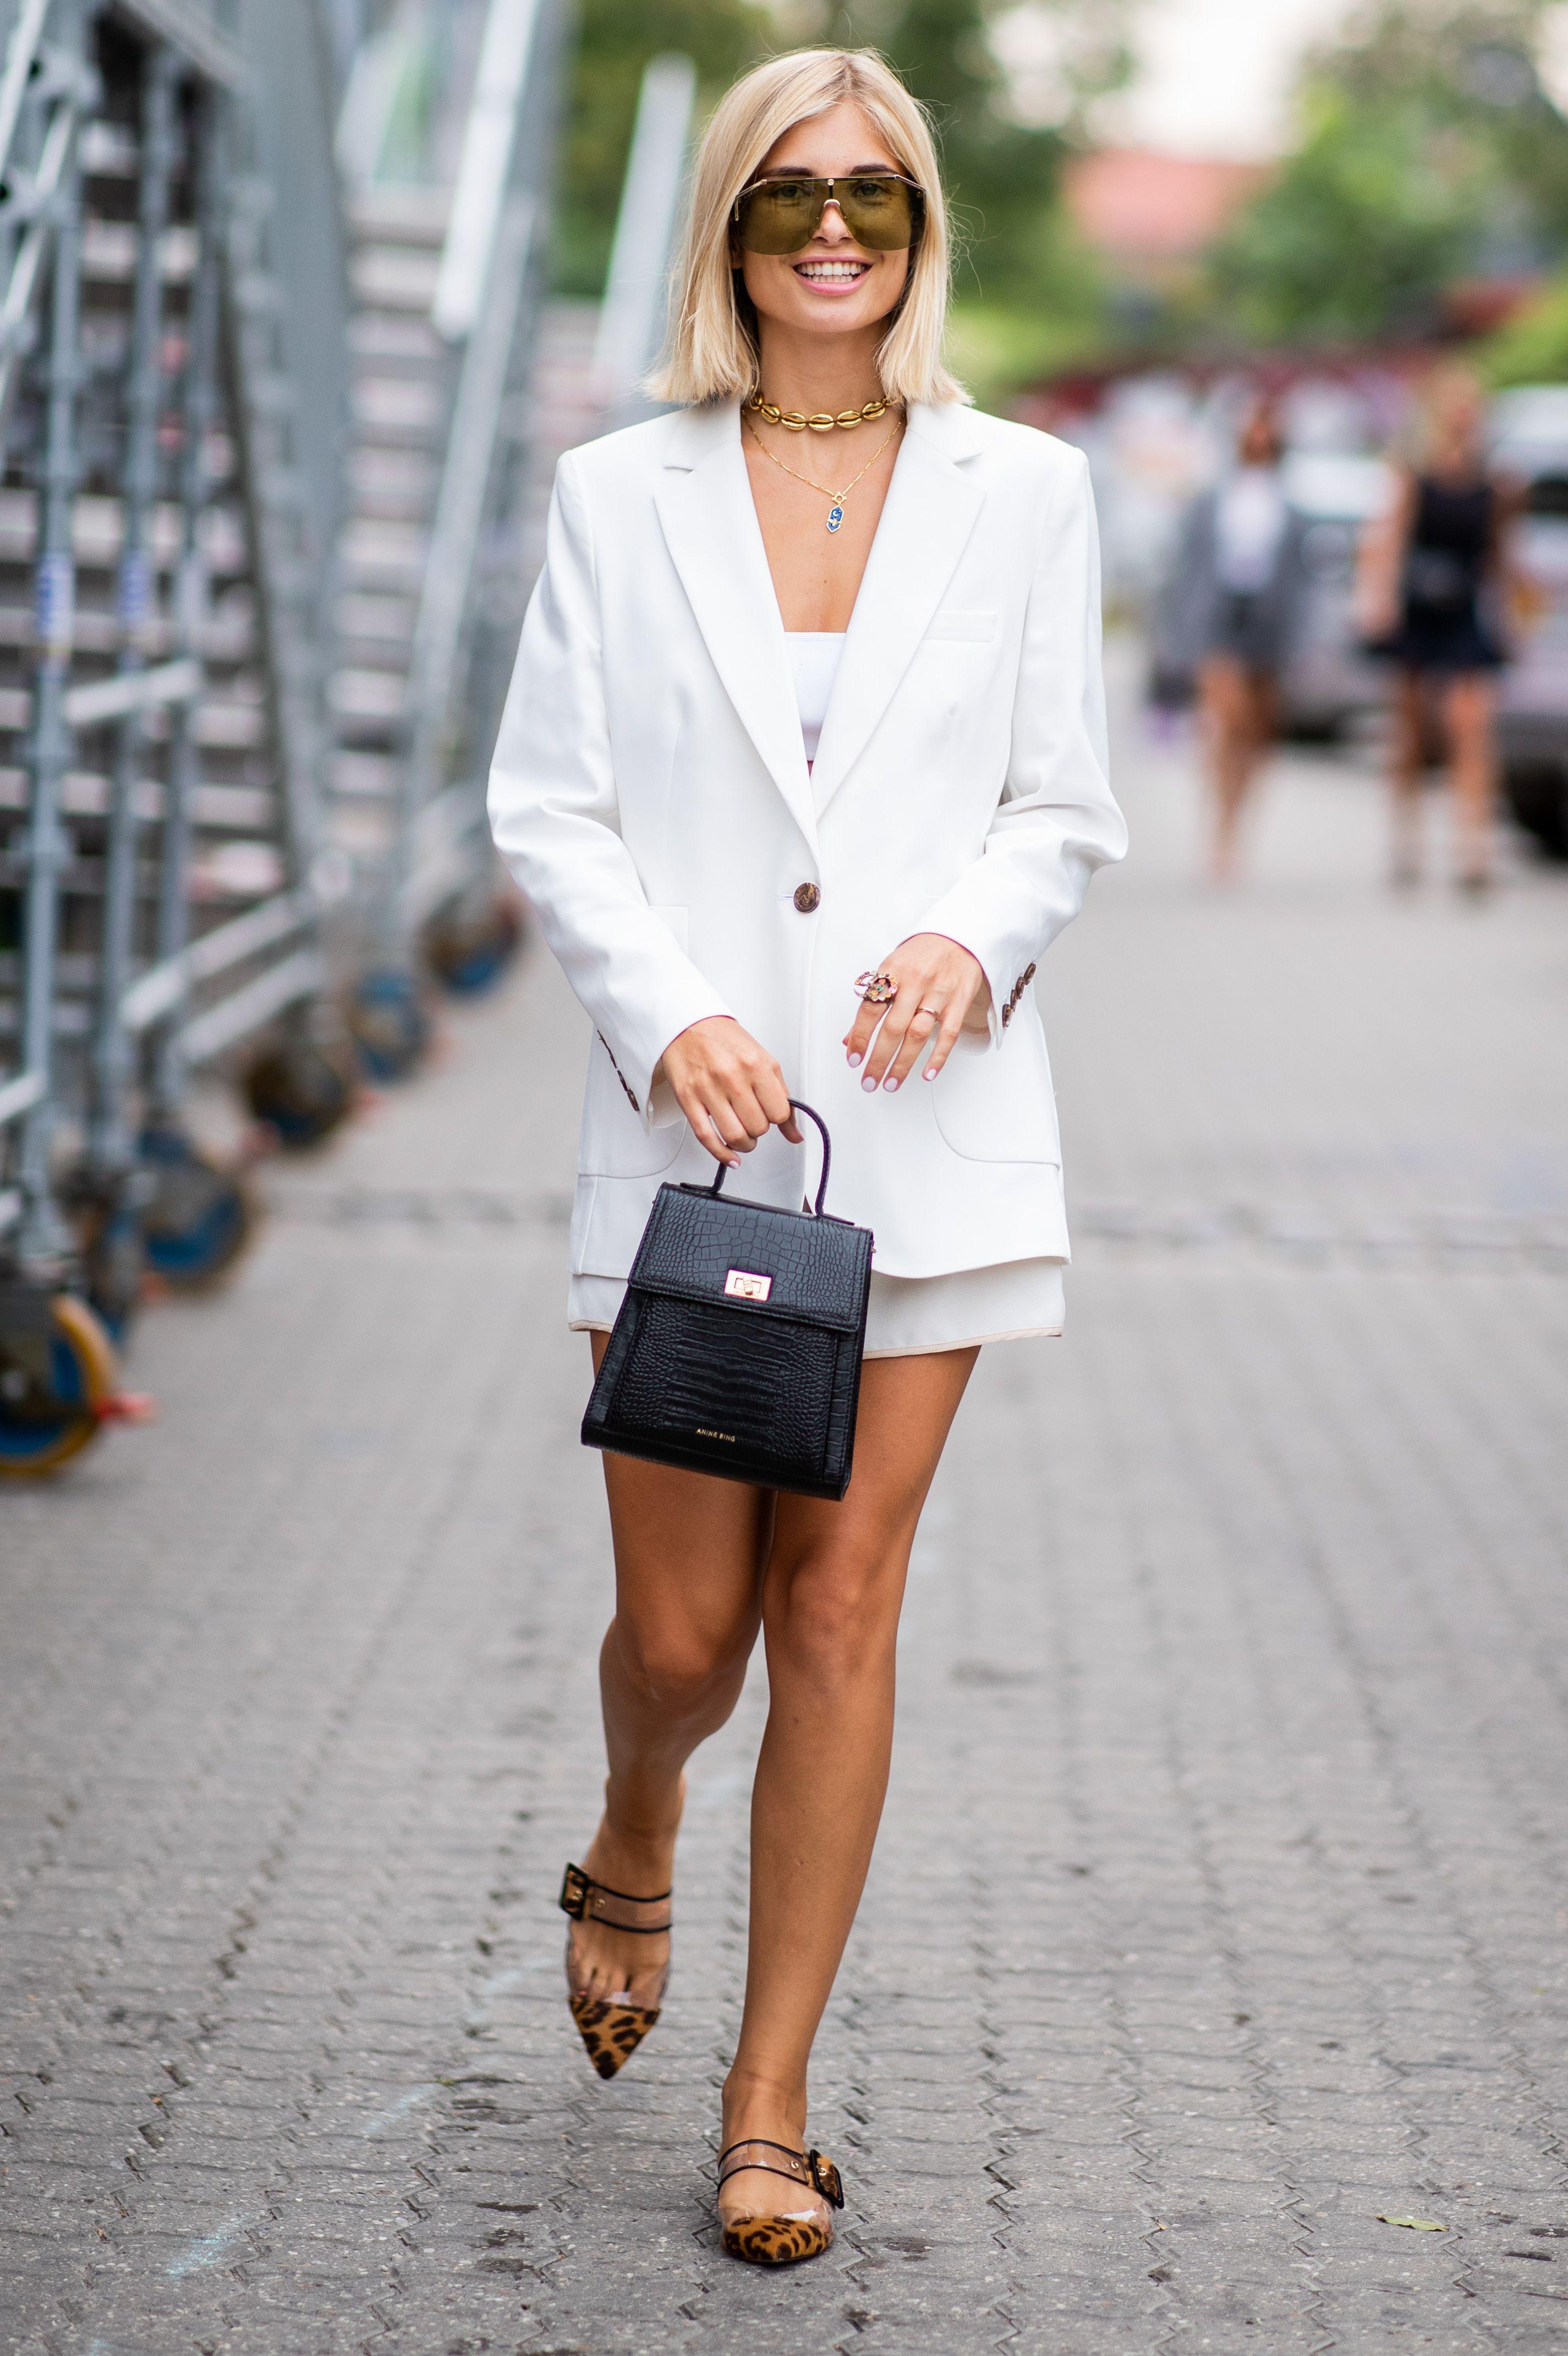 Cecilie Bahnsen, Copenhagen Fashion Week, Ellery, Ganni, Moschino, Net-A-Porter, Rejina Pyo, Rosie Assoulin, The Volon, Ulla Johnson, 哥本哈根時裝秀, 洋裝, 街拍, 黑白